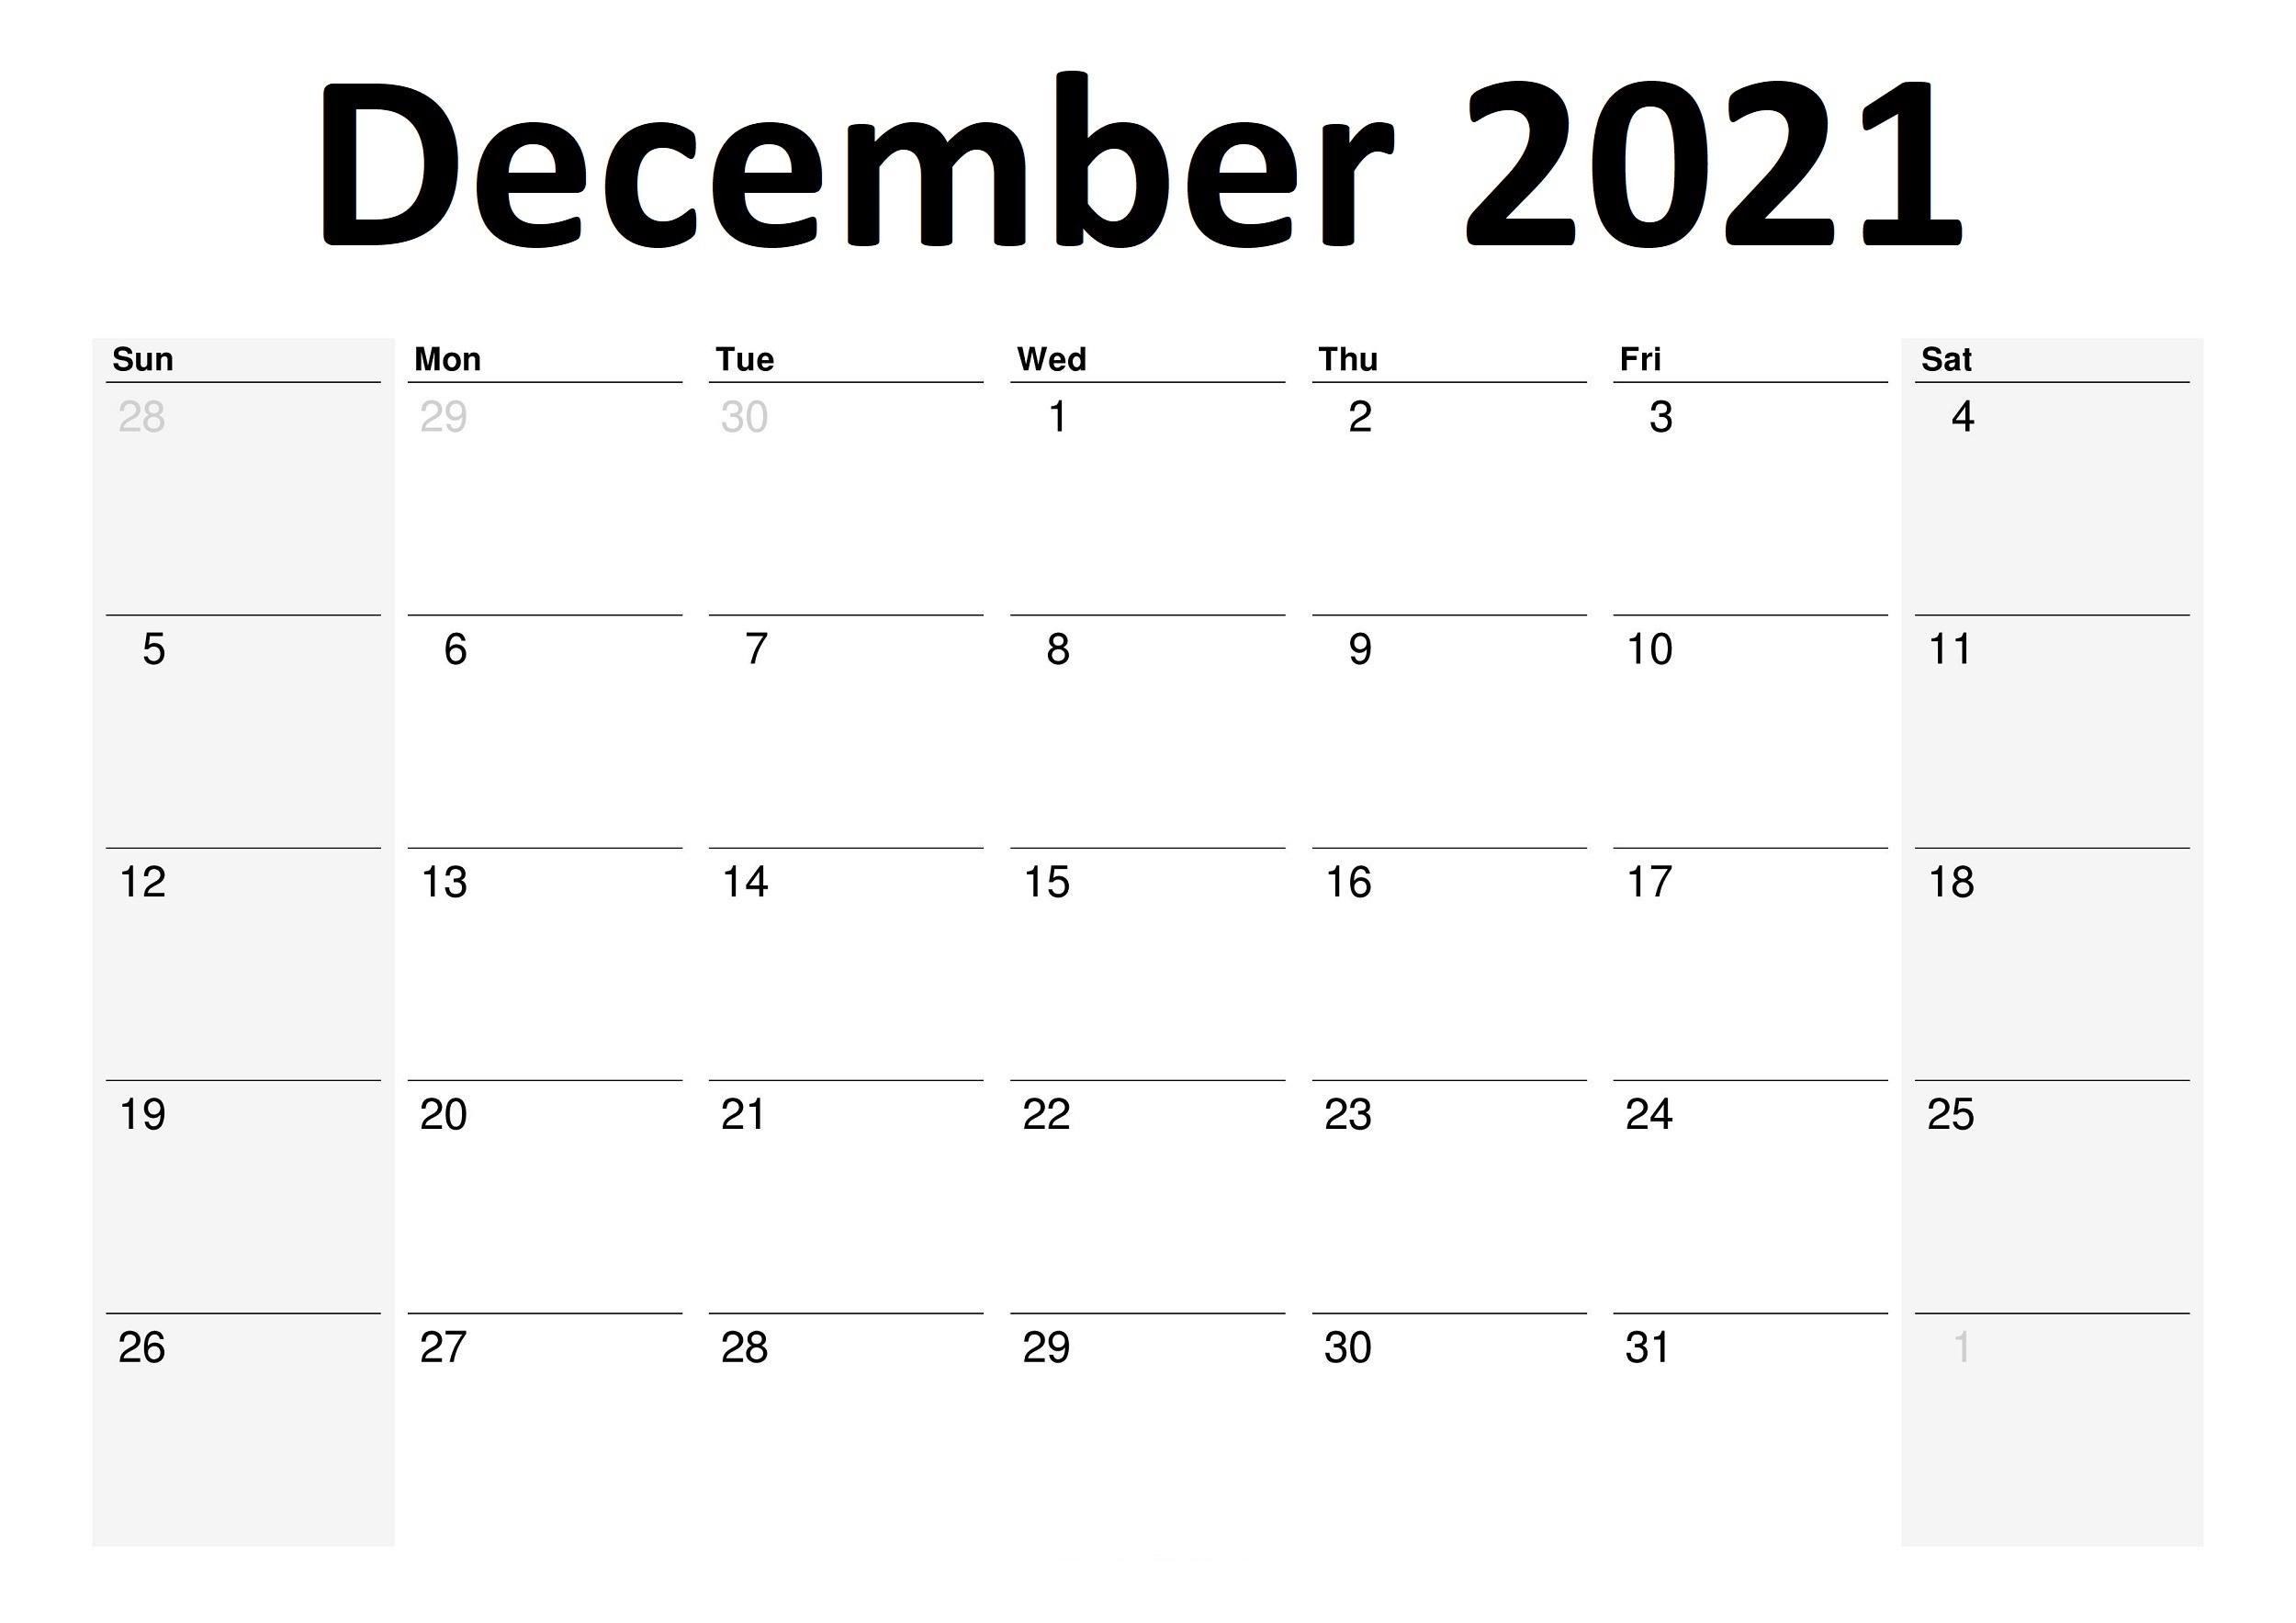 December 2021 Printable Calendar Big Boxes